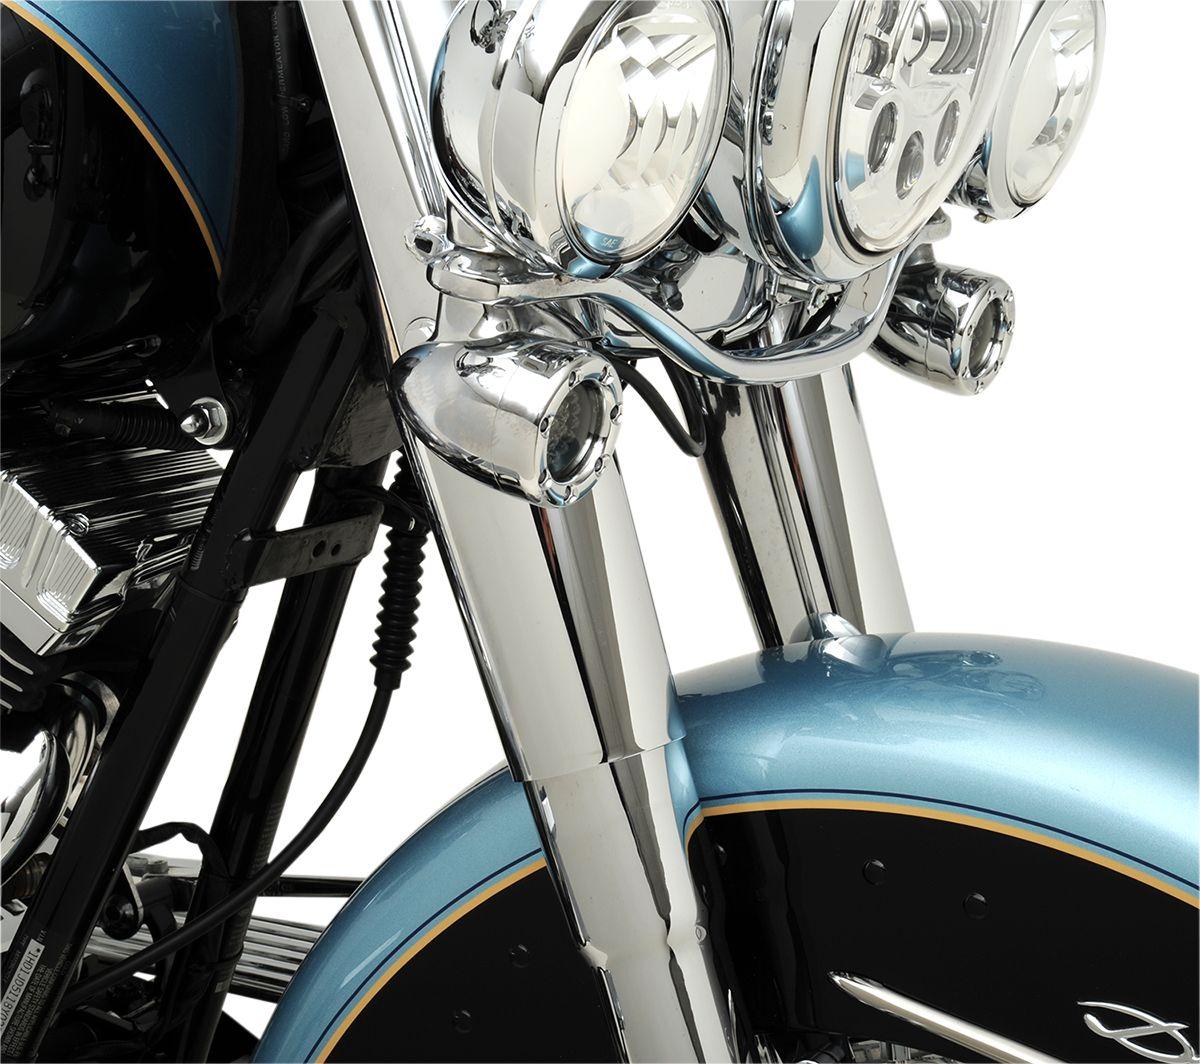 【Drag Specialties】前叉護蓋/ 鍍鉻 FL 1949-13 【COVER SLDR CHR 49-13 FL [DS-222898]】 - 「Webike-摩托百貨」